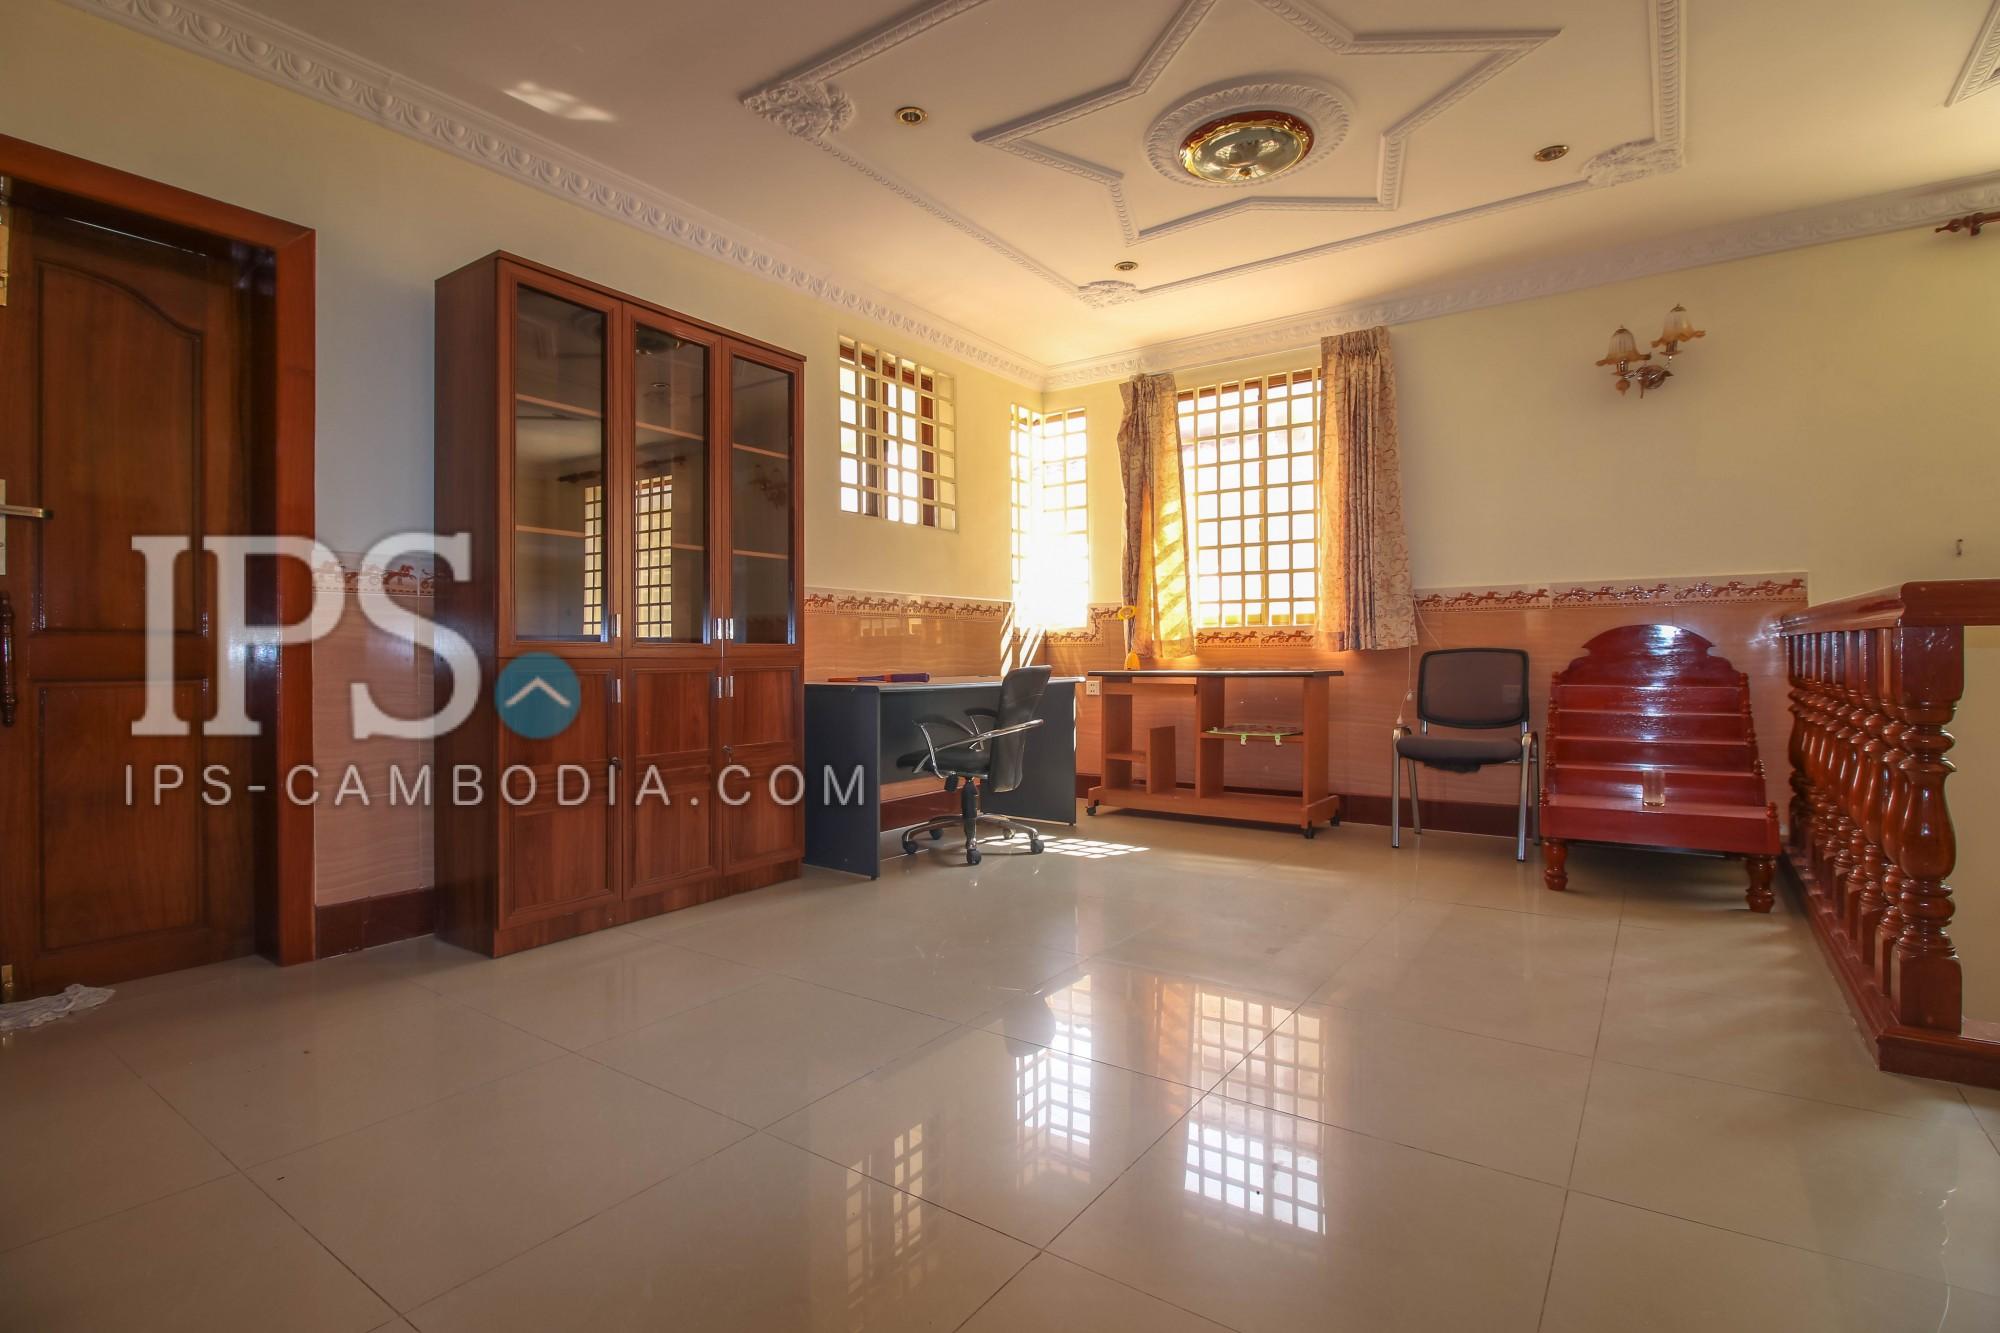 3 Bedroom Villa  For Rent - Chroy Changva, Phnom Penh